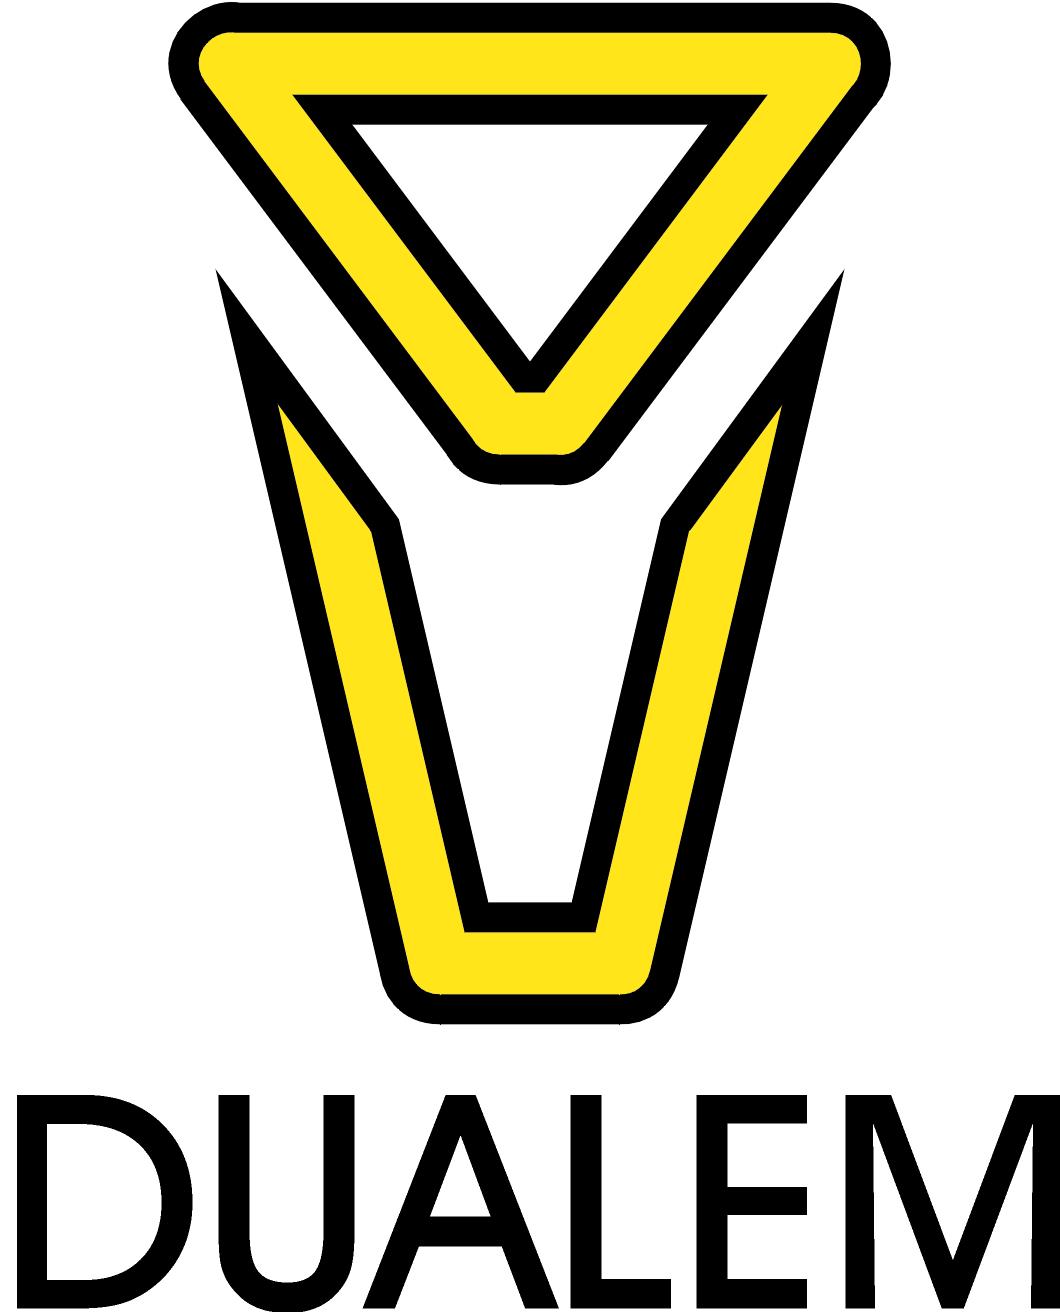 Dualem logo